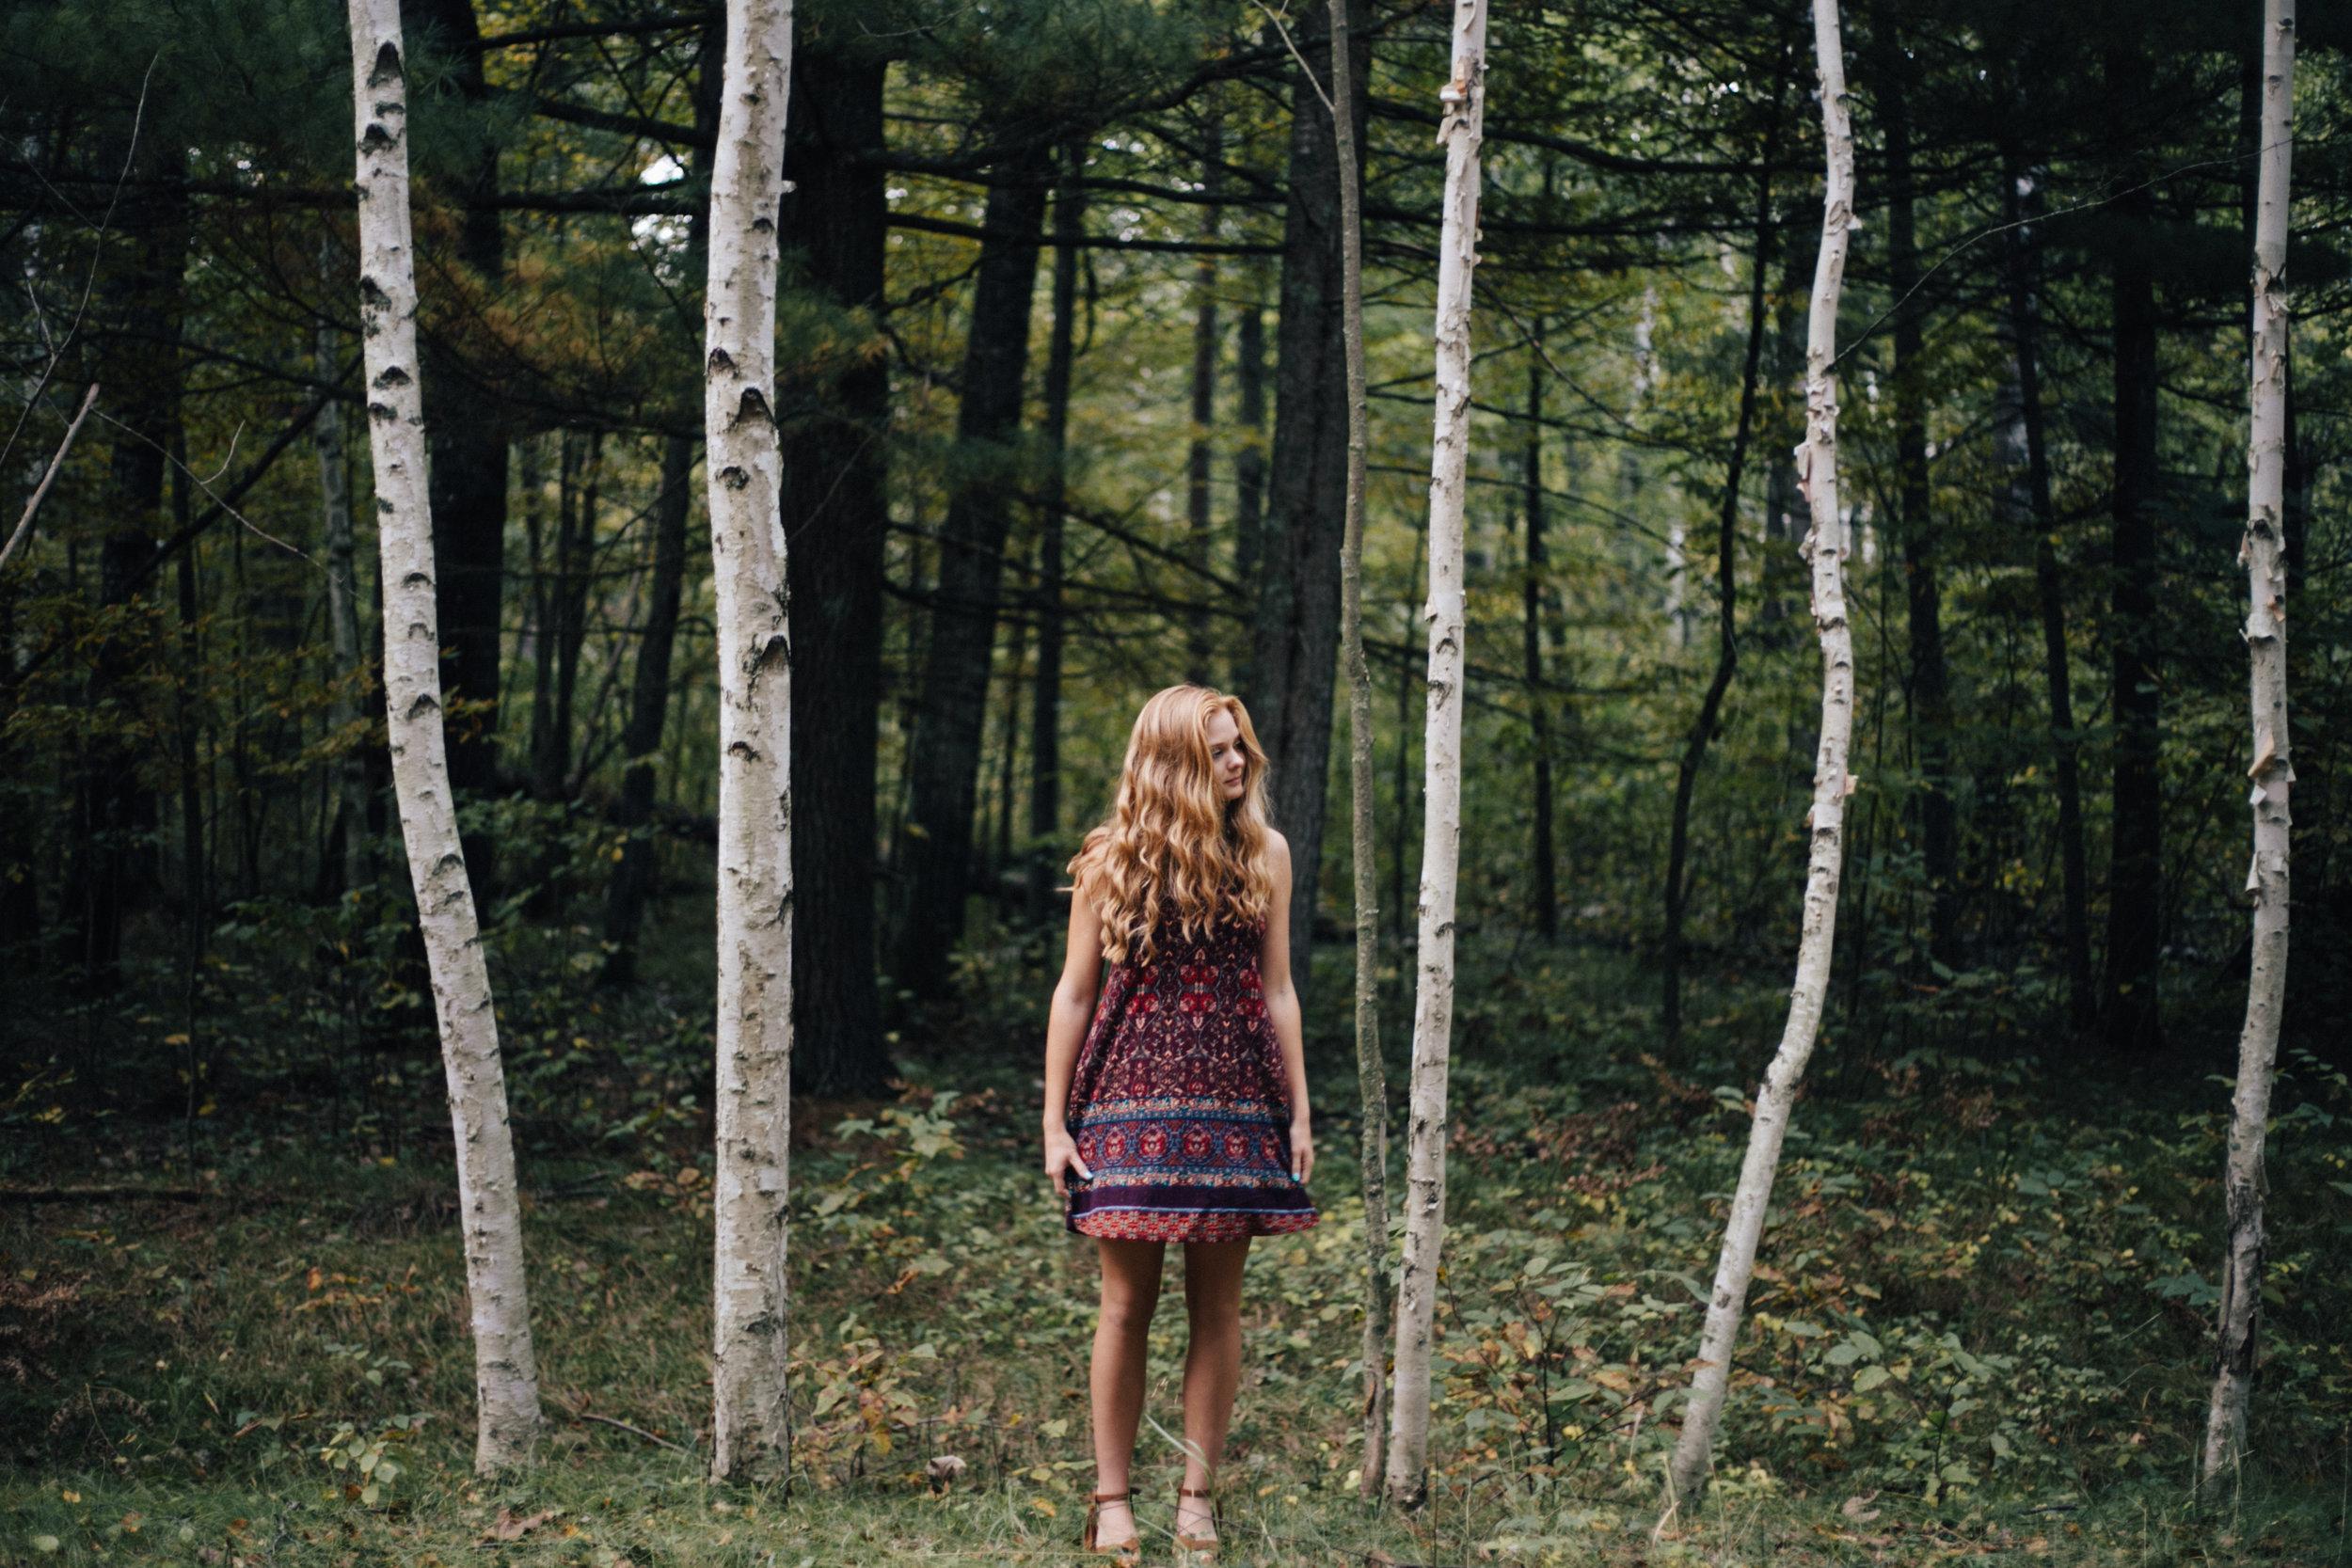 Modern, editorial inspired high school senior photography by Britt DeZeeuw in Brainerd Minnesota